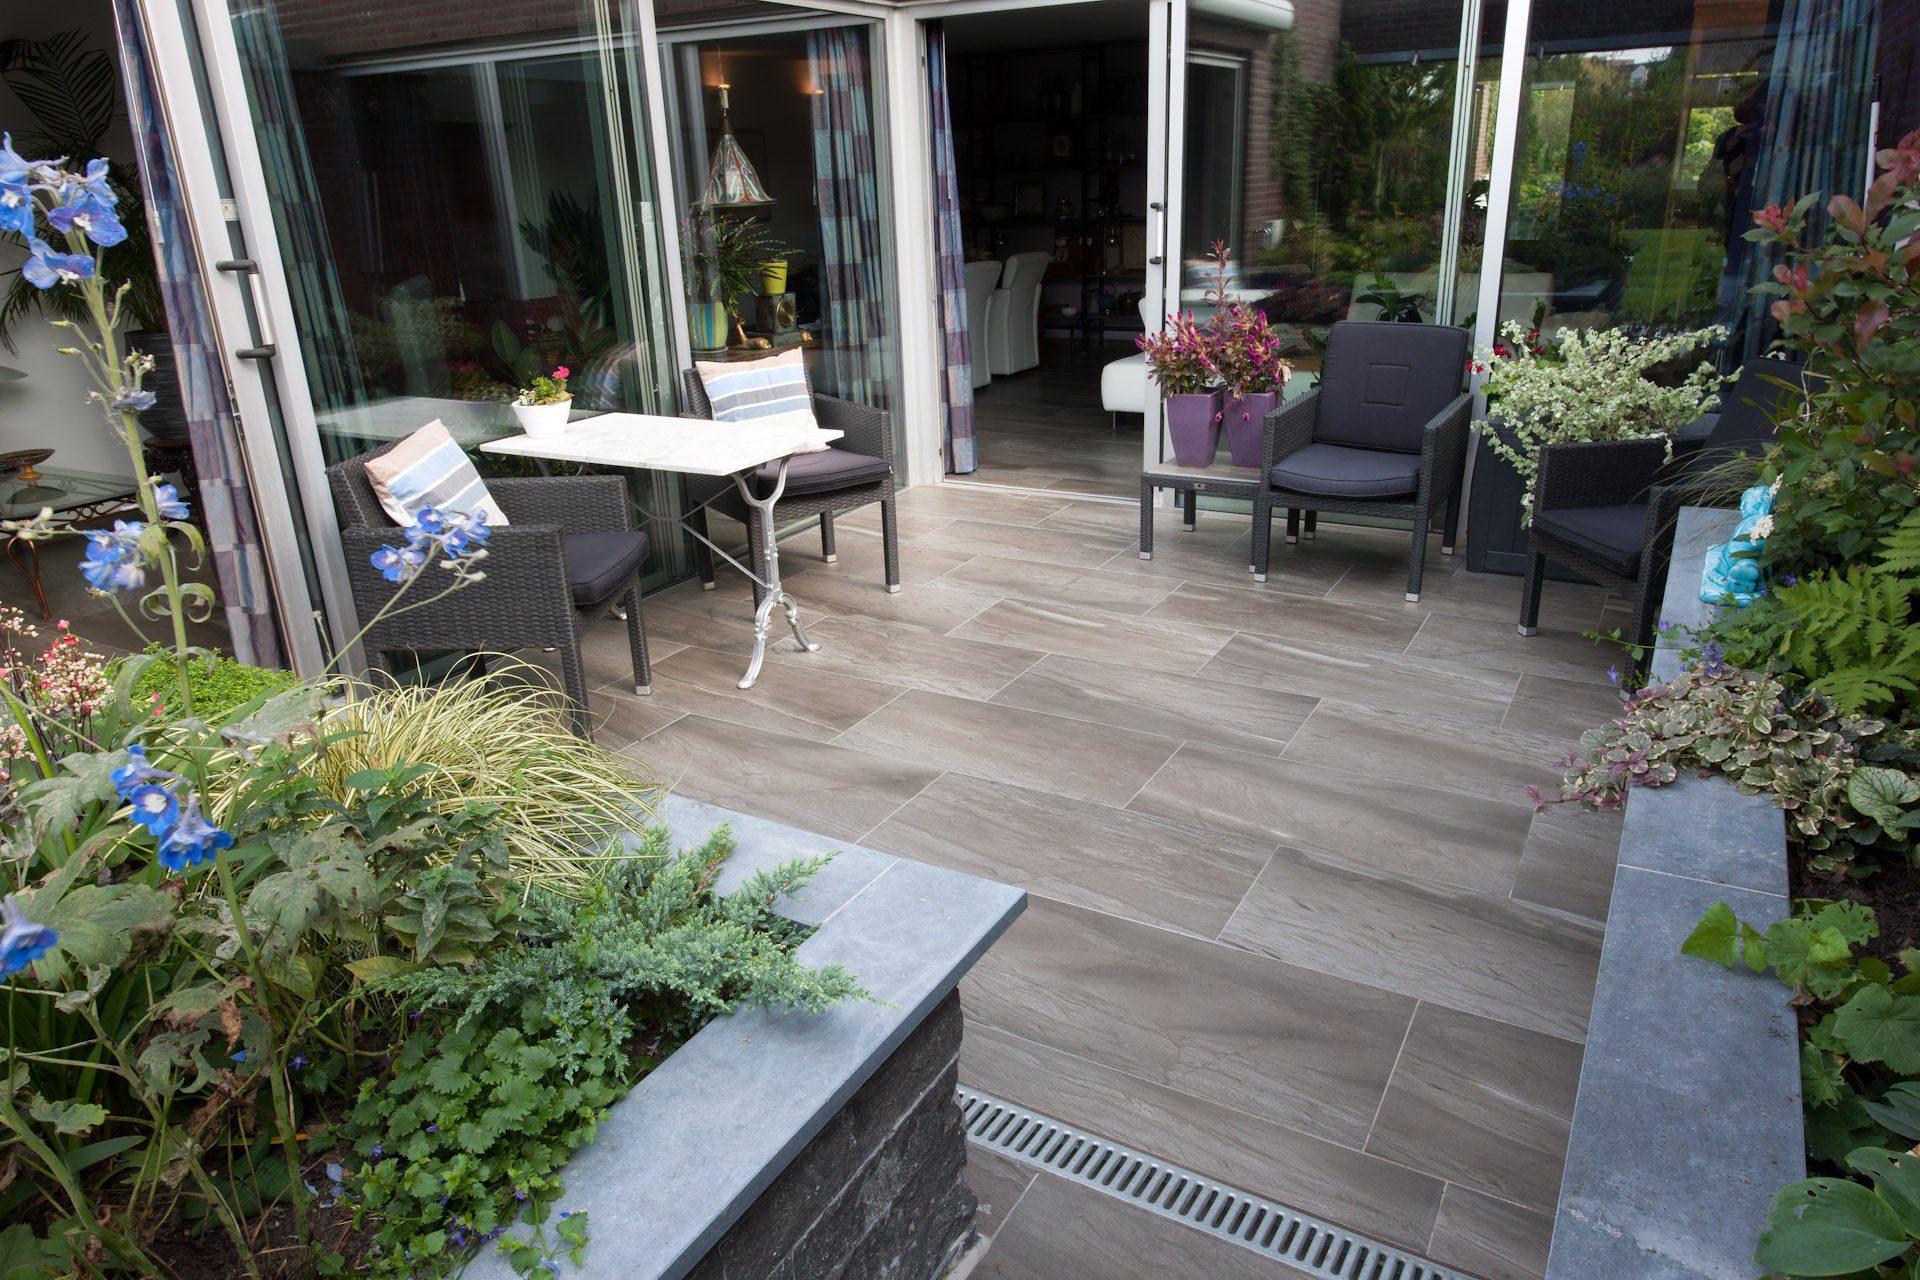 Houtlook Tegels Buiten : Tegels buiten houtlook keramische tuintegels houtlook